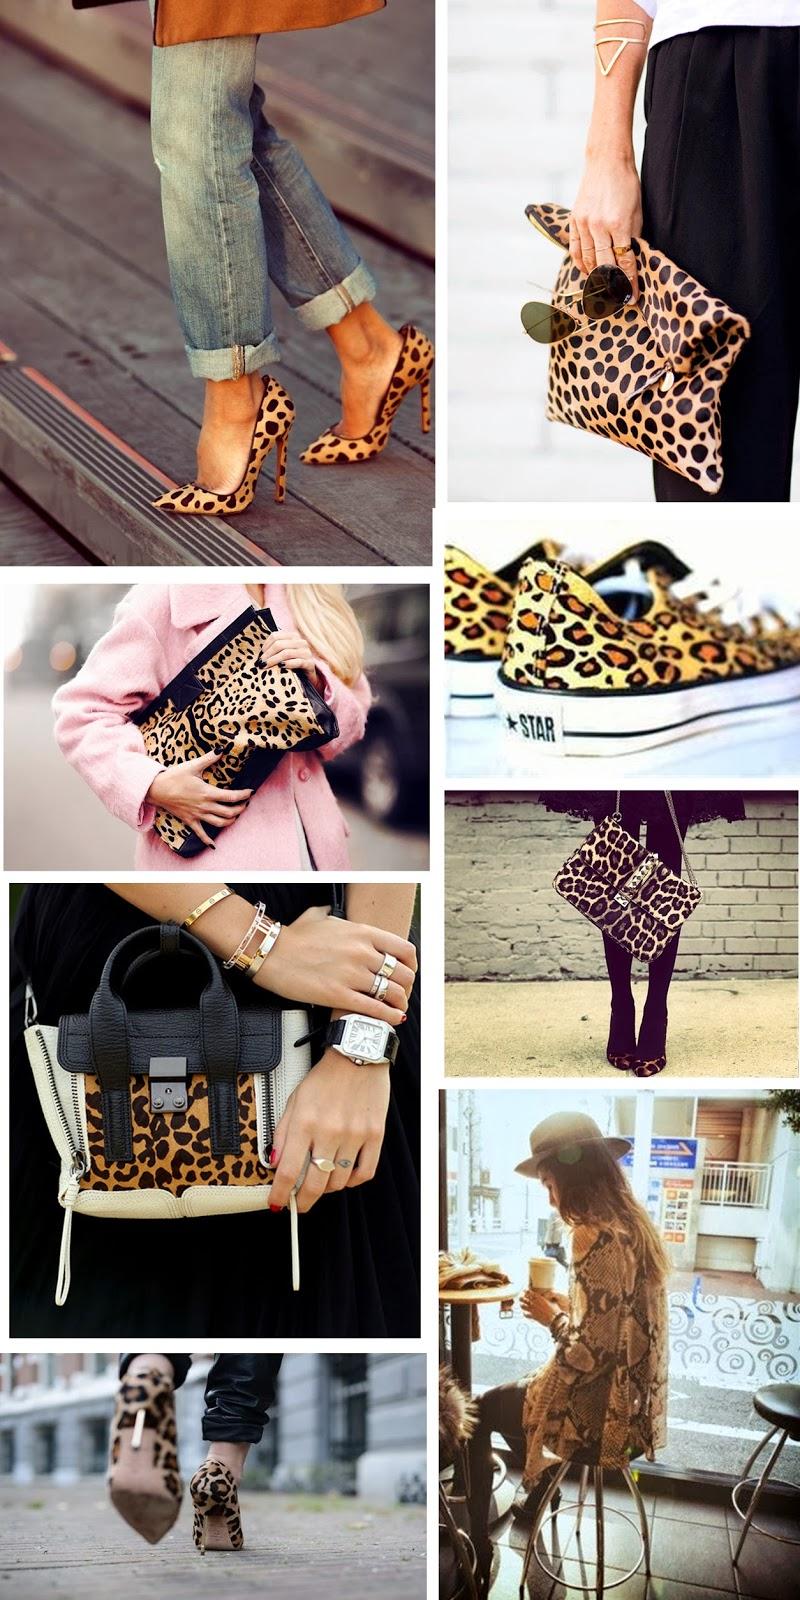 animal print trend, inspiration photos, fashion inspiration, leopard print on clothes, animal print heels shoes, animal print bag clutch, victoria tornegren bag, converse all star animal print chucks, fashion blogger